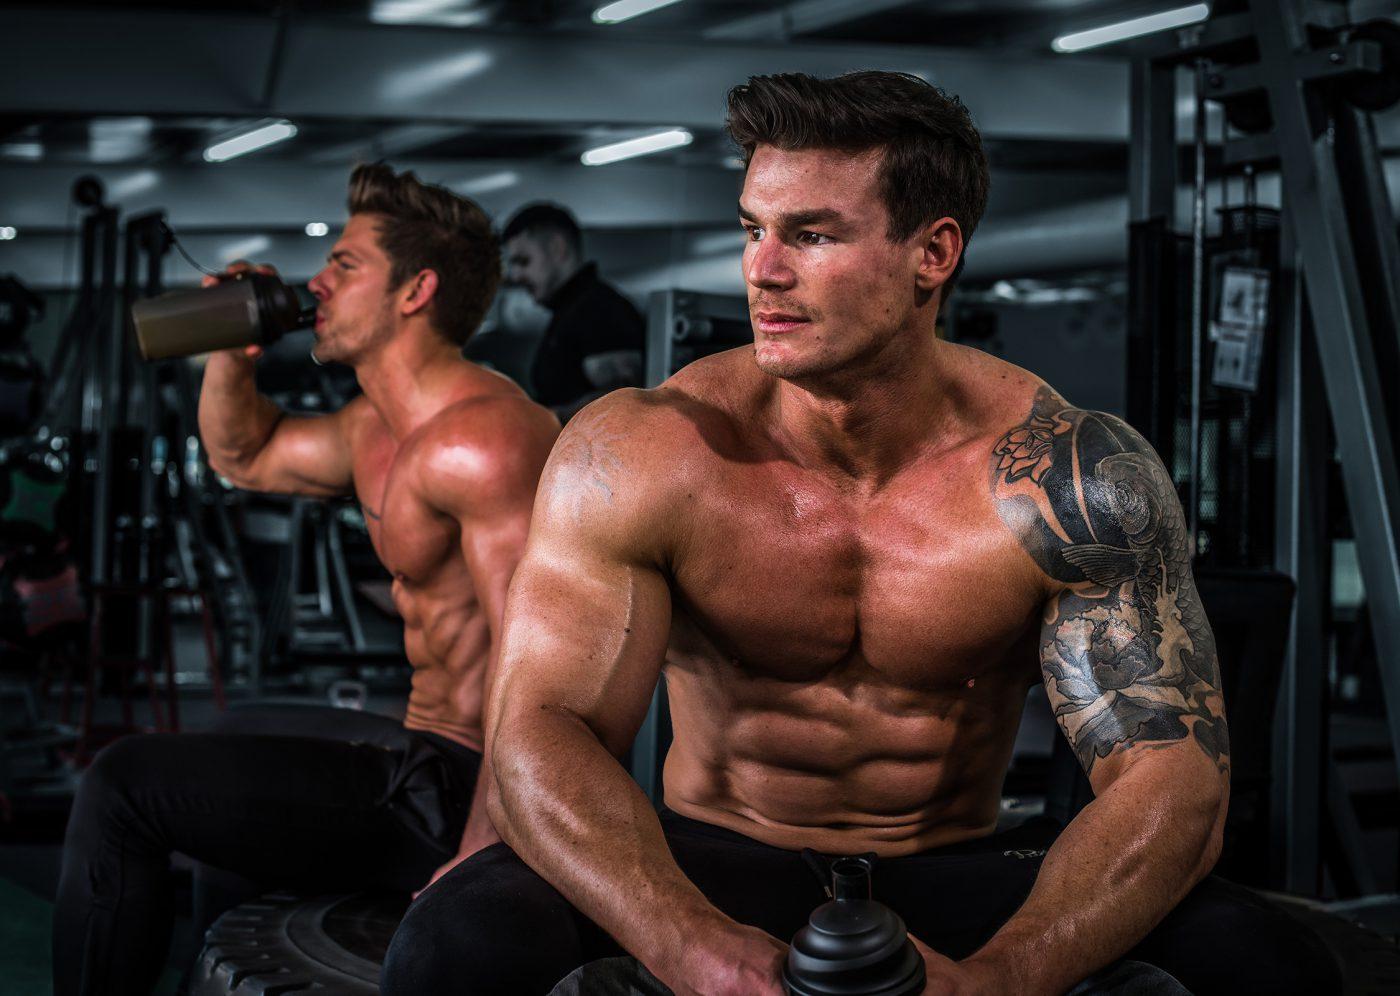 muscular-men-in-gym